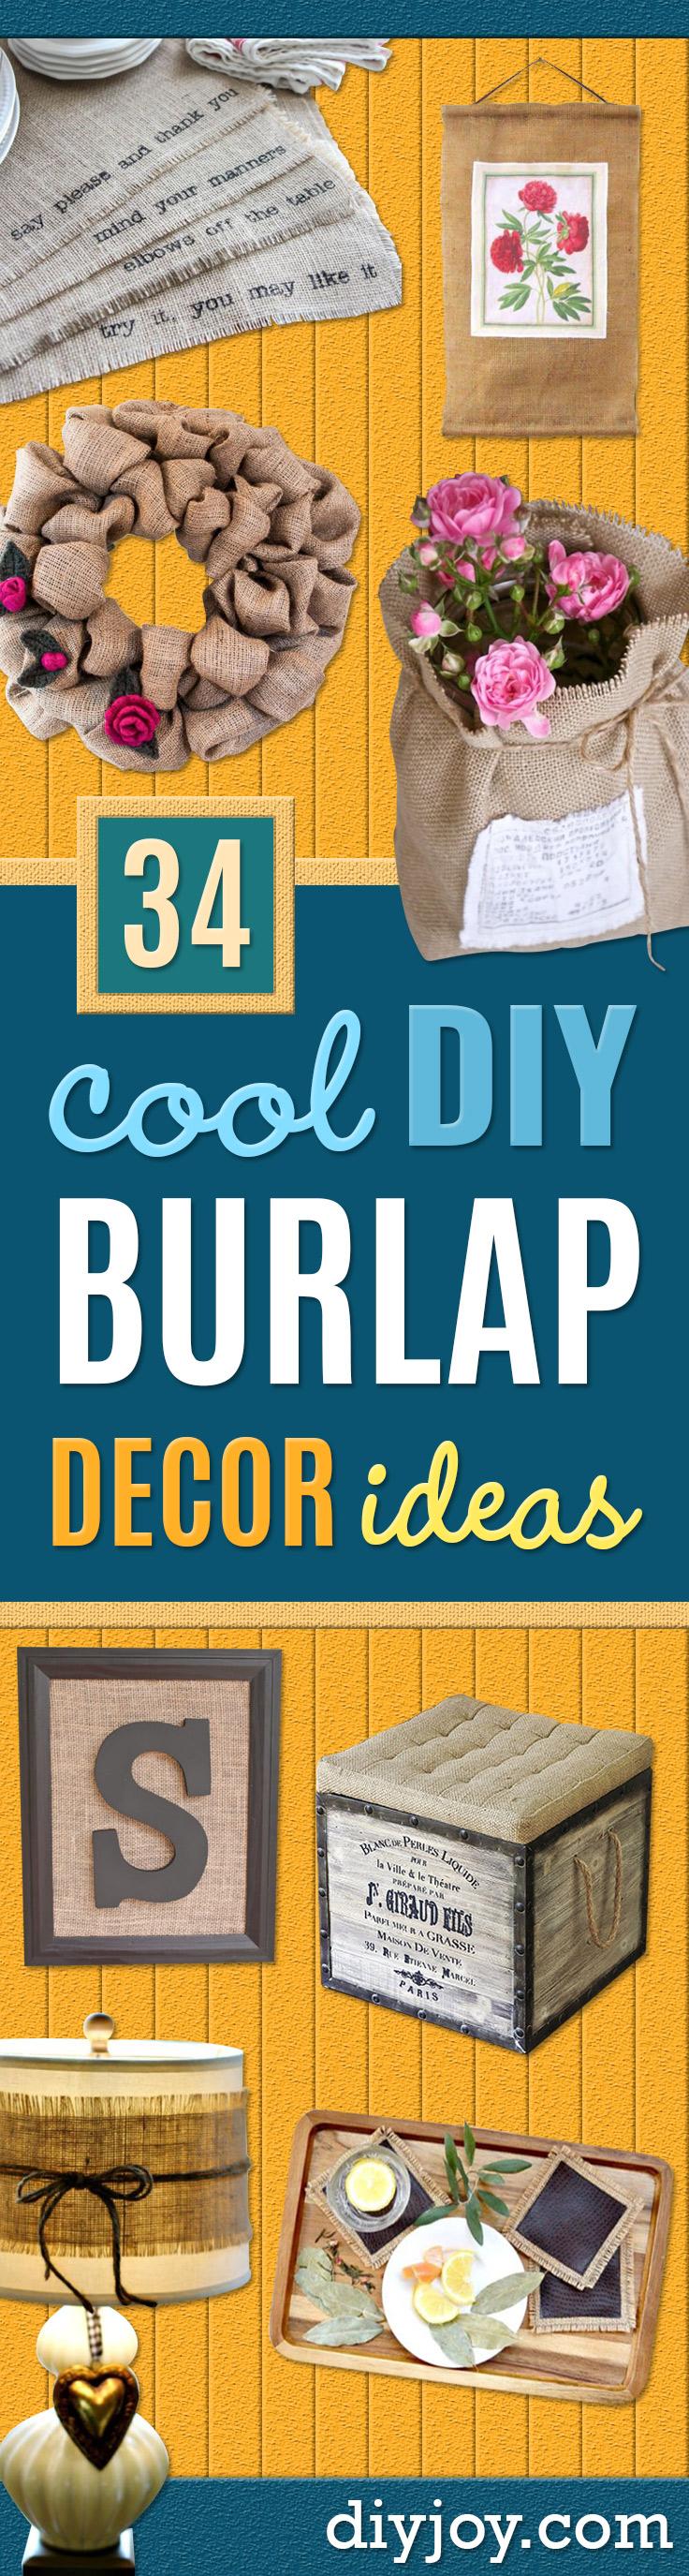 34 Creative Diy Burlap Decor Ideas